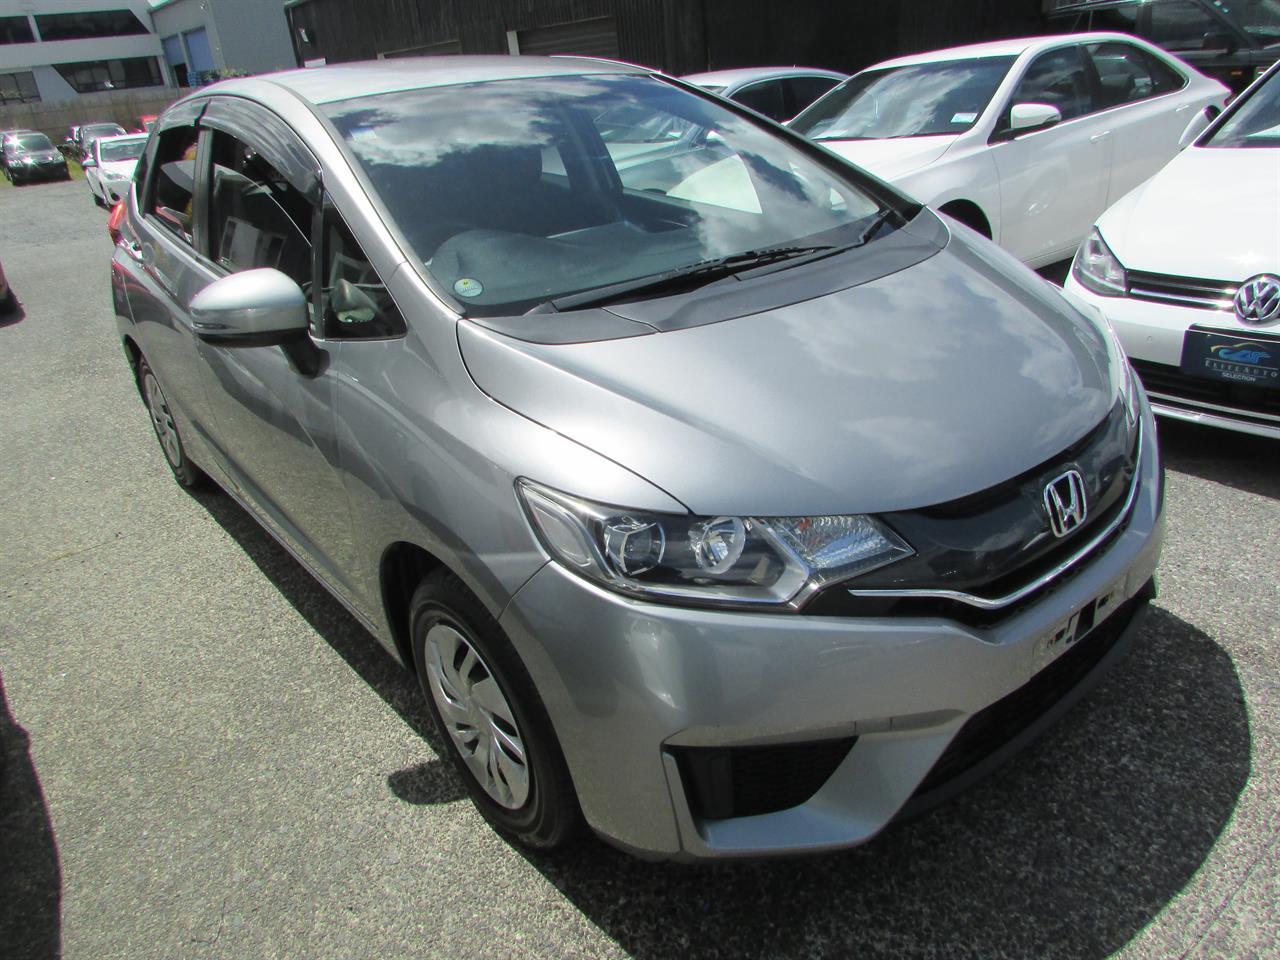 Motors Cars & parts Cars : 2013 Honda Fit 1.3 VTEC CAMCHAIN REVERSE CAMERA